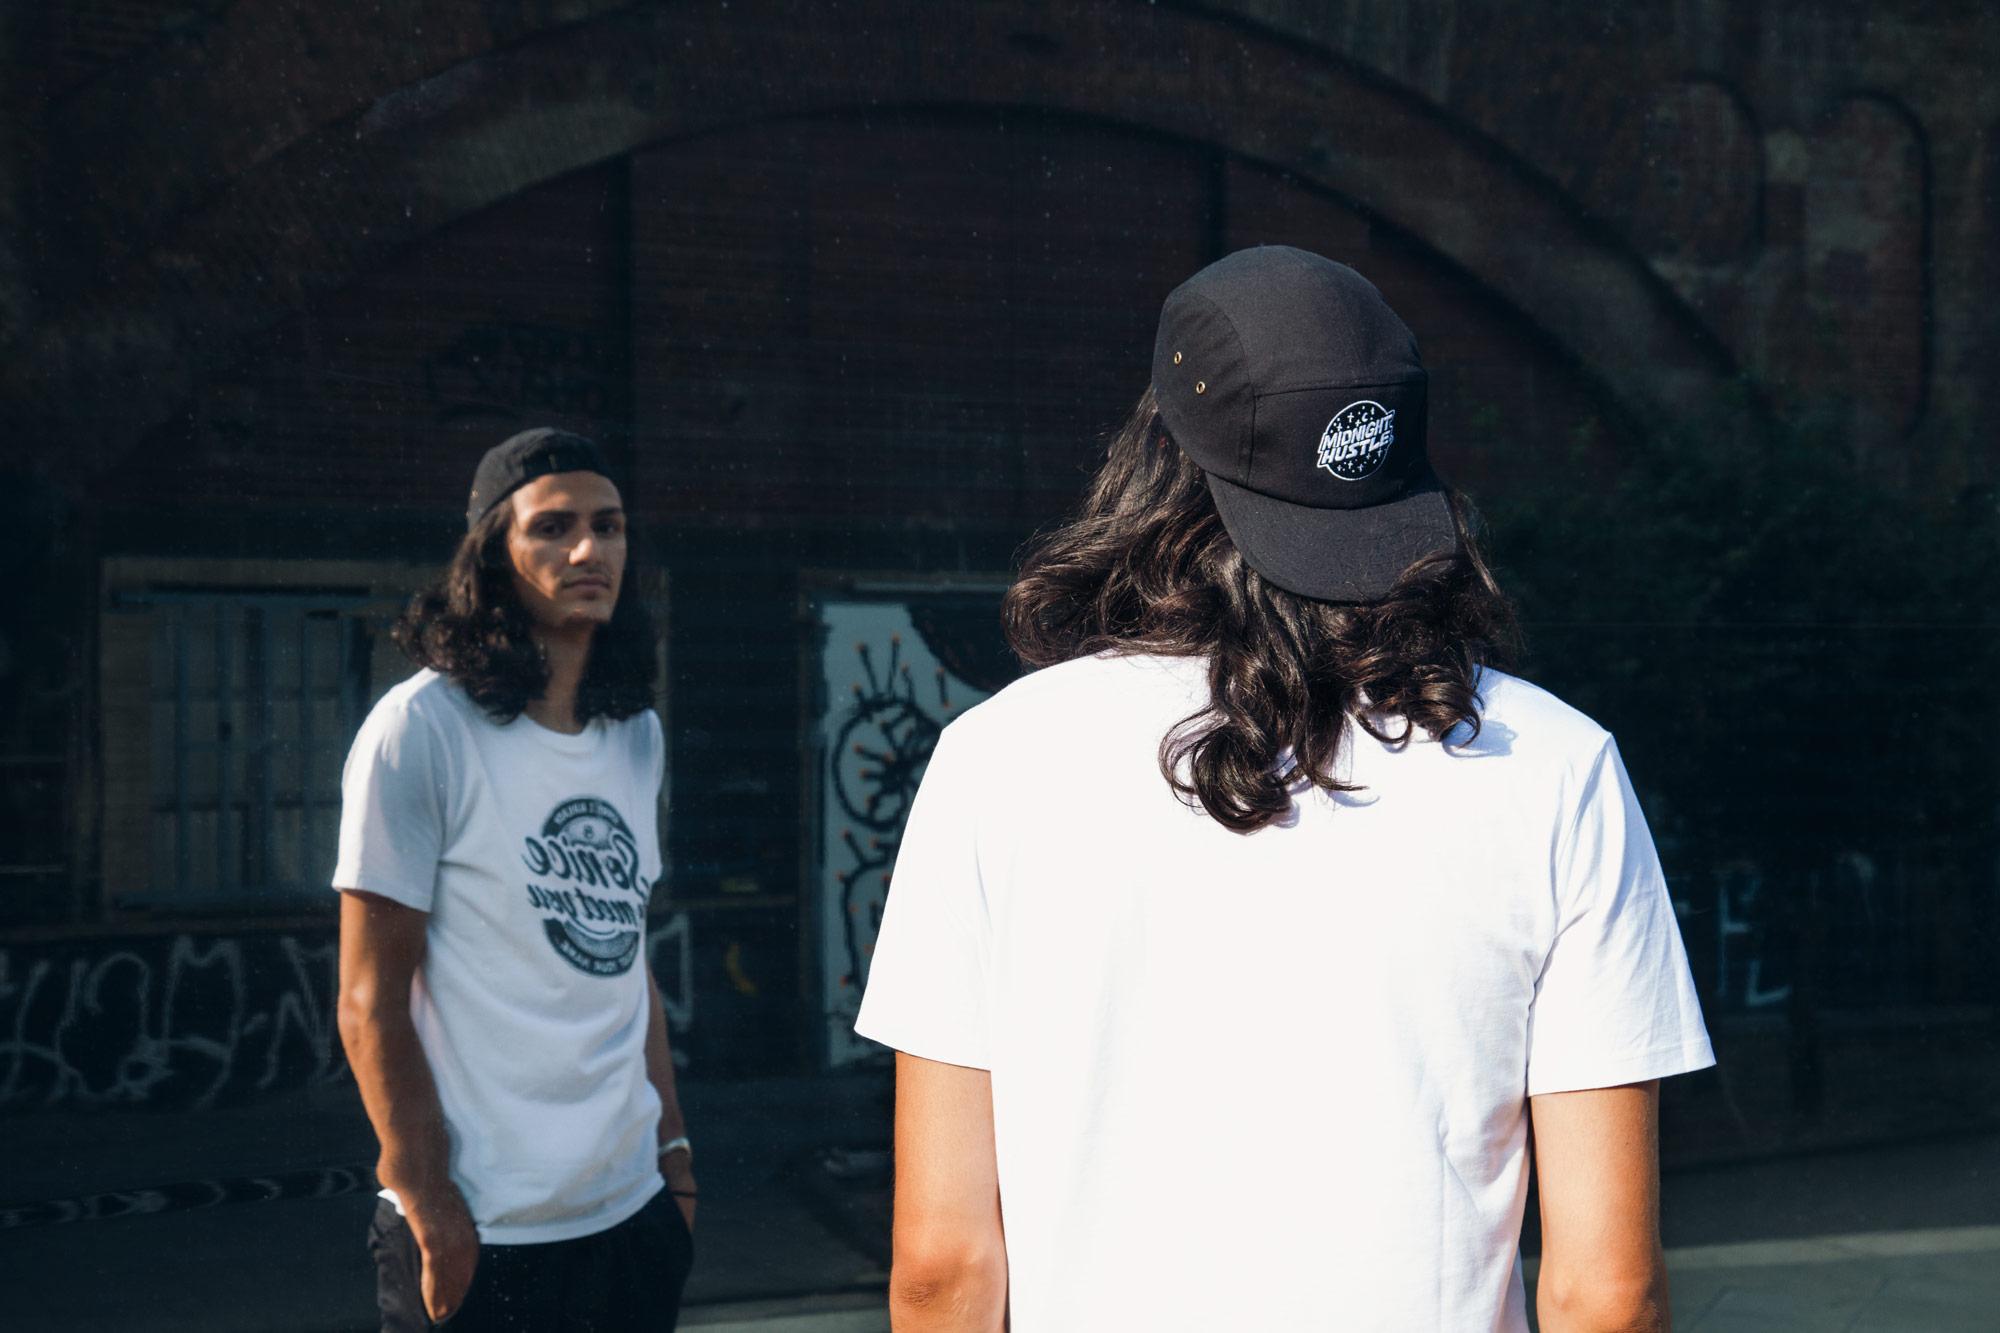 T-shirt and cap by SNEEER. ©Rylsee